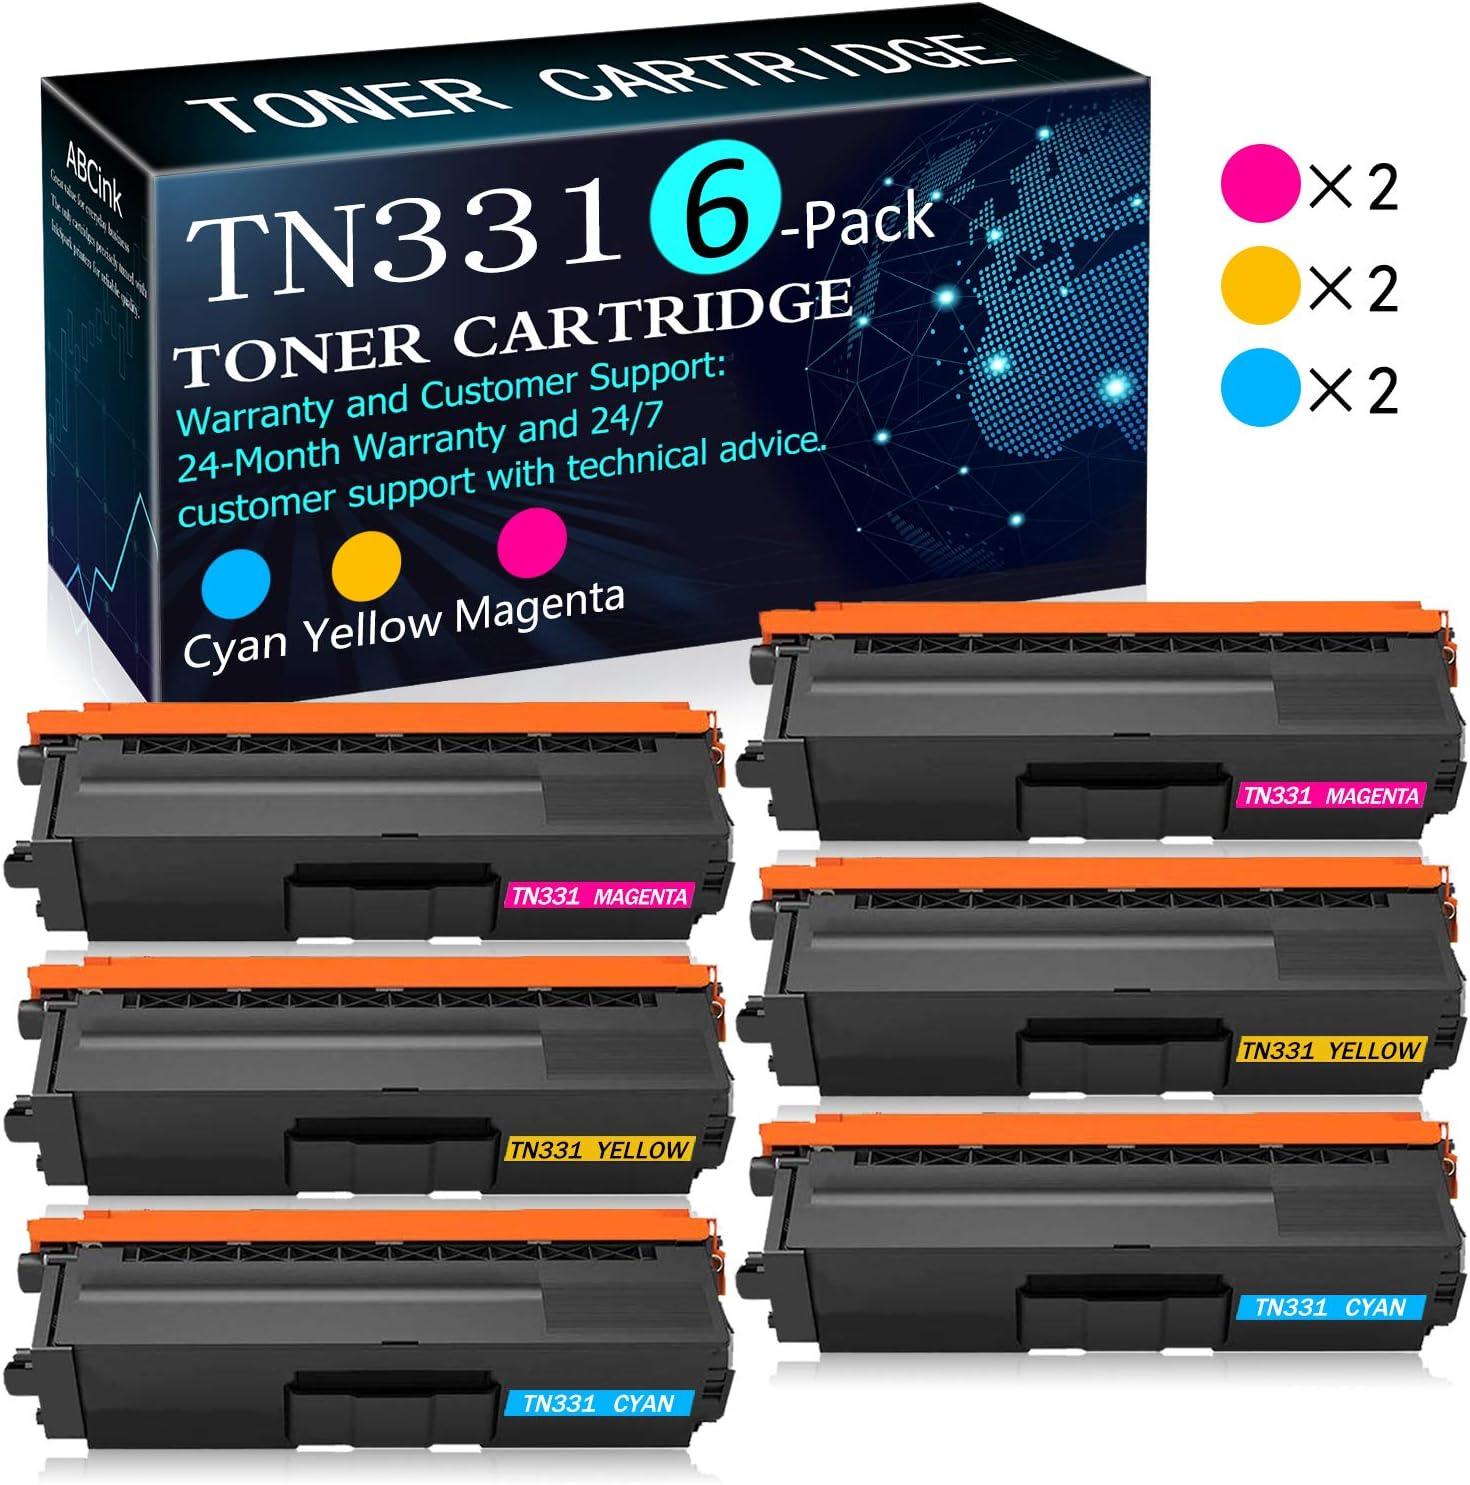 TN331 Toner Cartridge Replacement for Brother HL-L8250CDN L8350CDW L9200CDW MFC-8600CDW L9550CDW L8850CDW DCP-9050CDN L8400CDN Printers Toner Cartridge 6 Pack 2C+2Y+2M